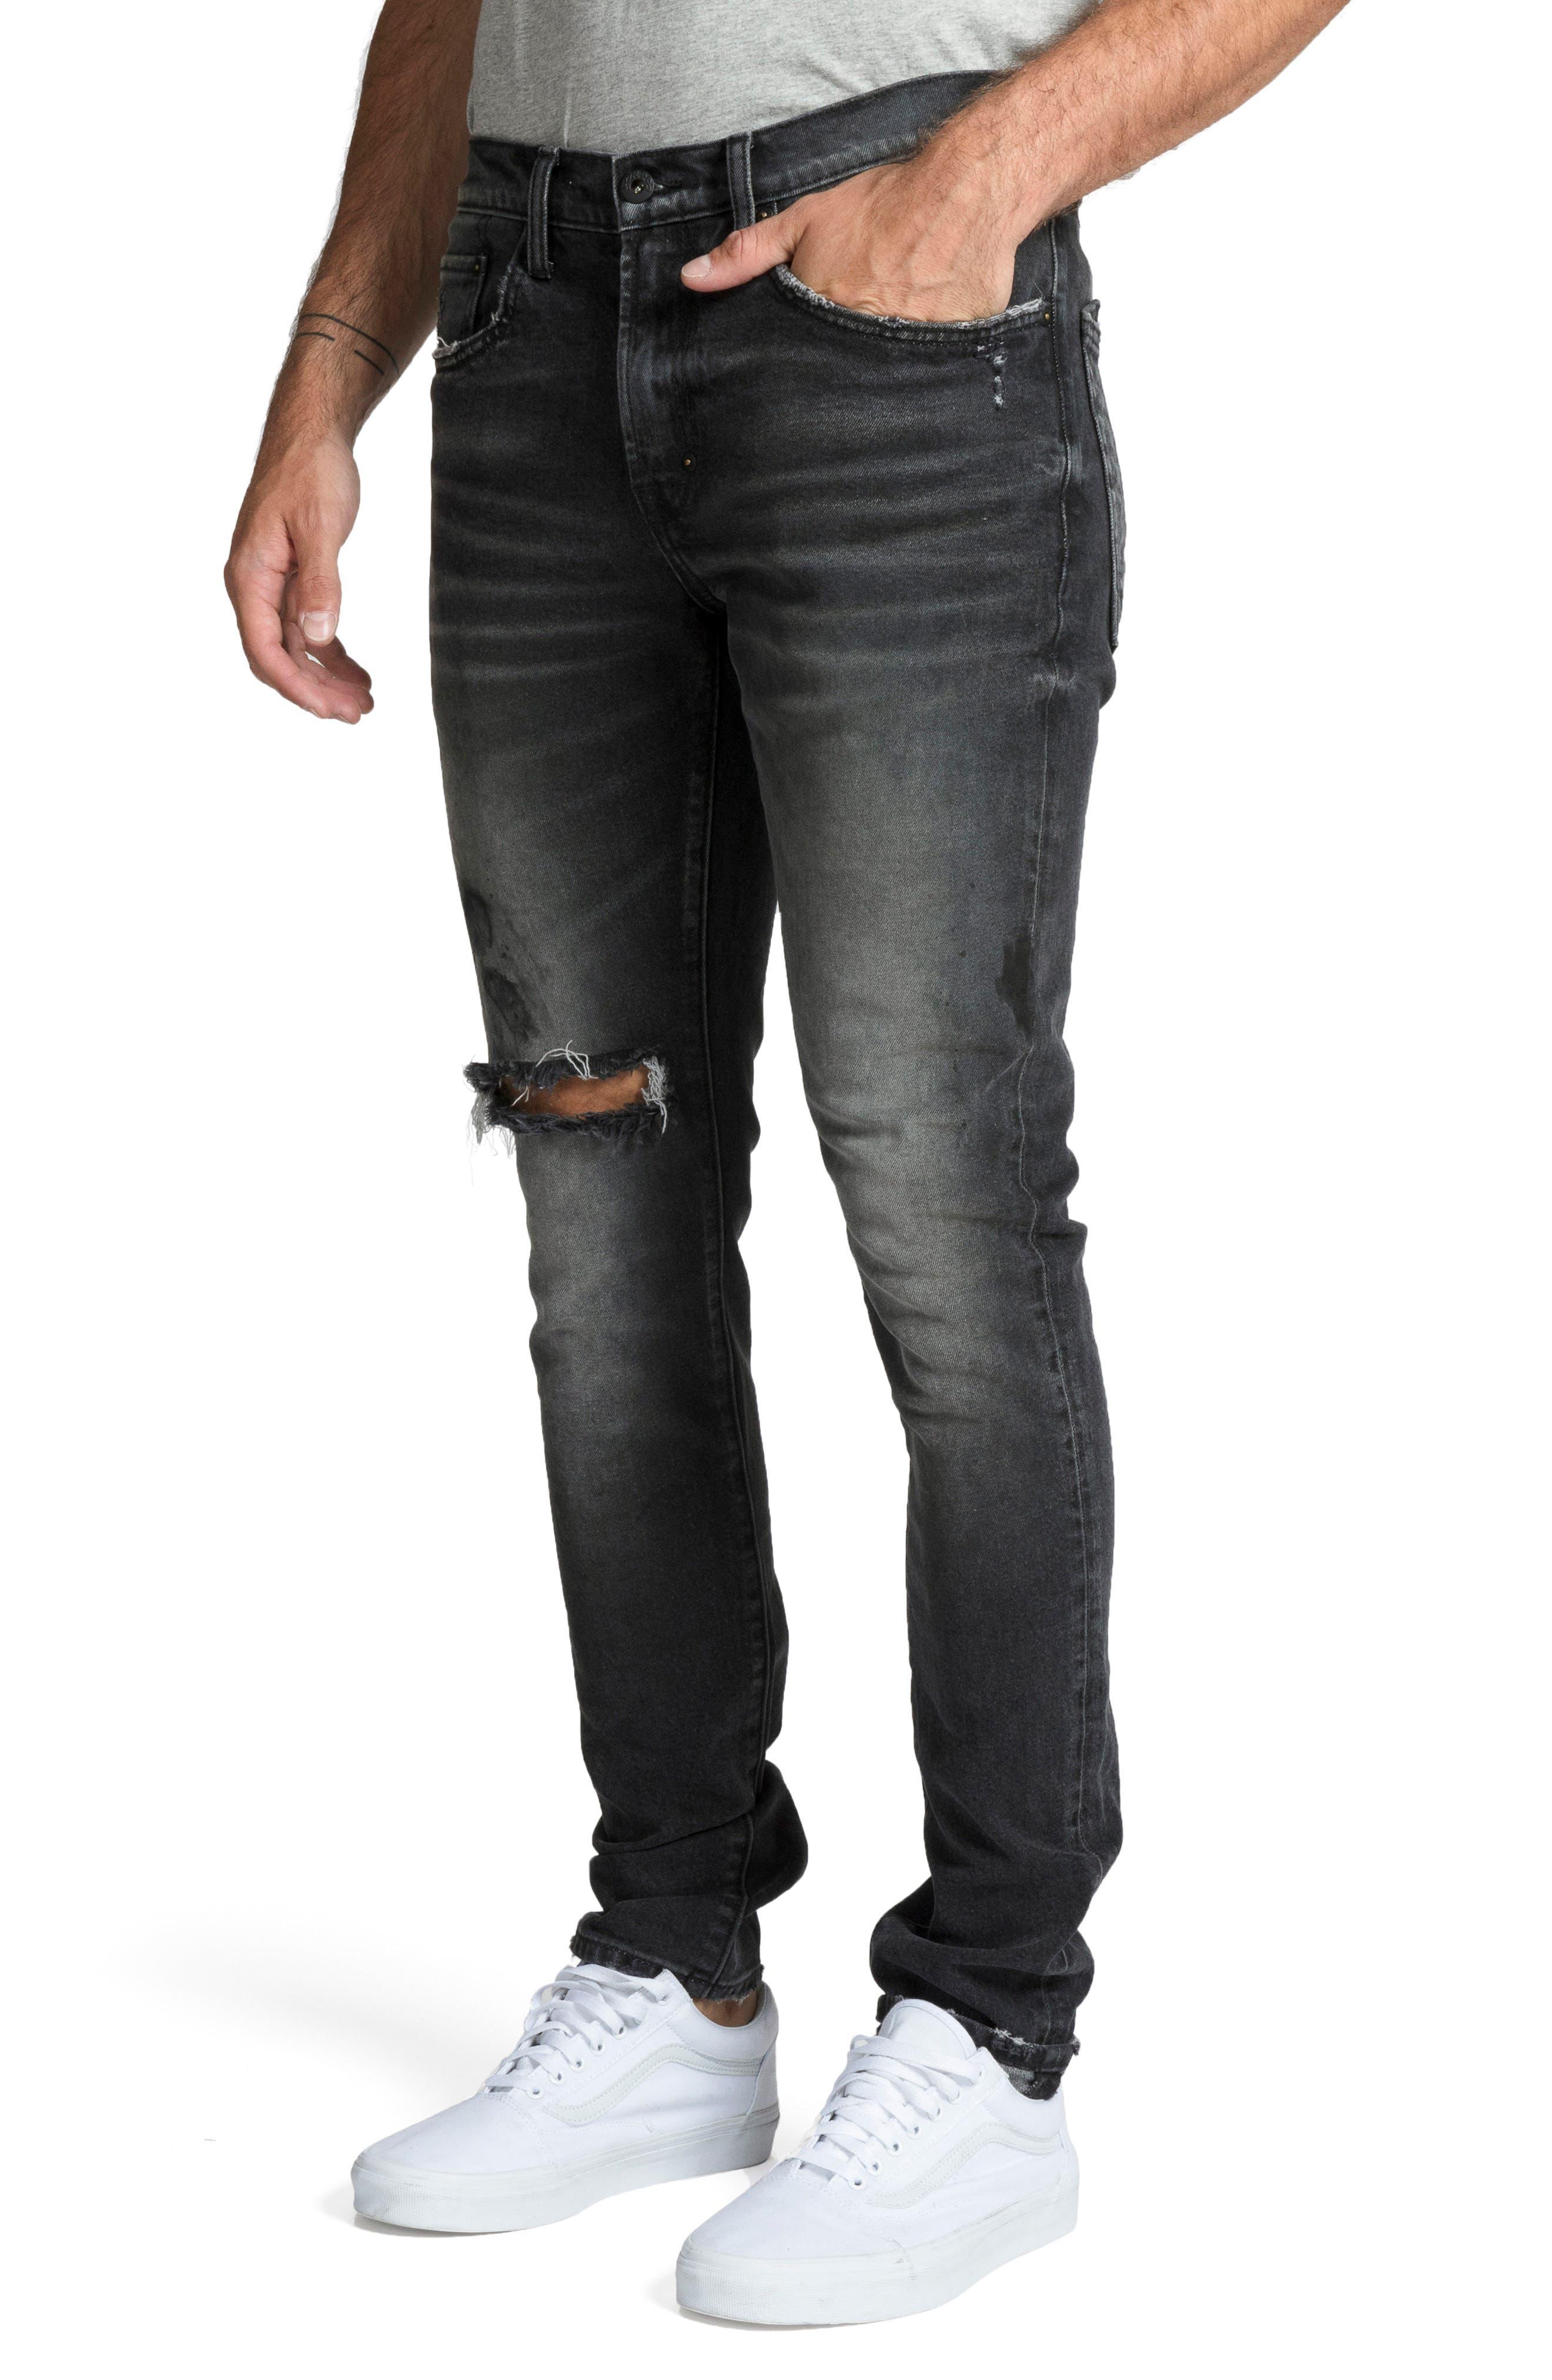 Windsor Skinny Fit Jeans,                             Alternate thumbnail 3, color,                             RESOLUTE